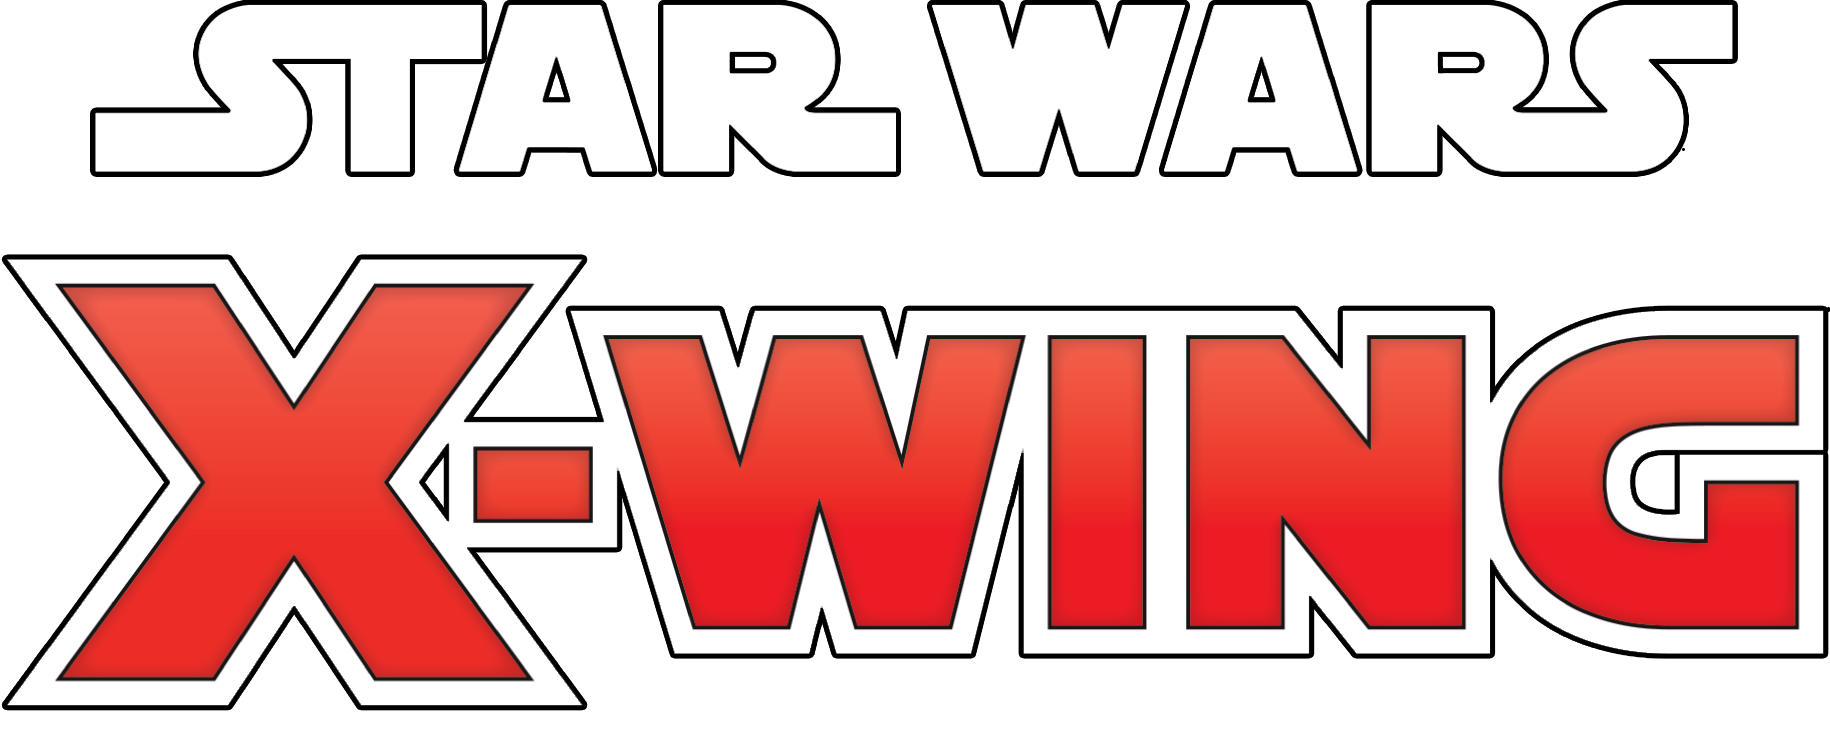 x-wing-logo.png